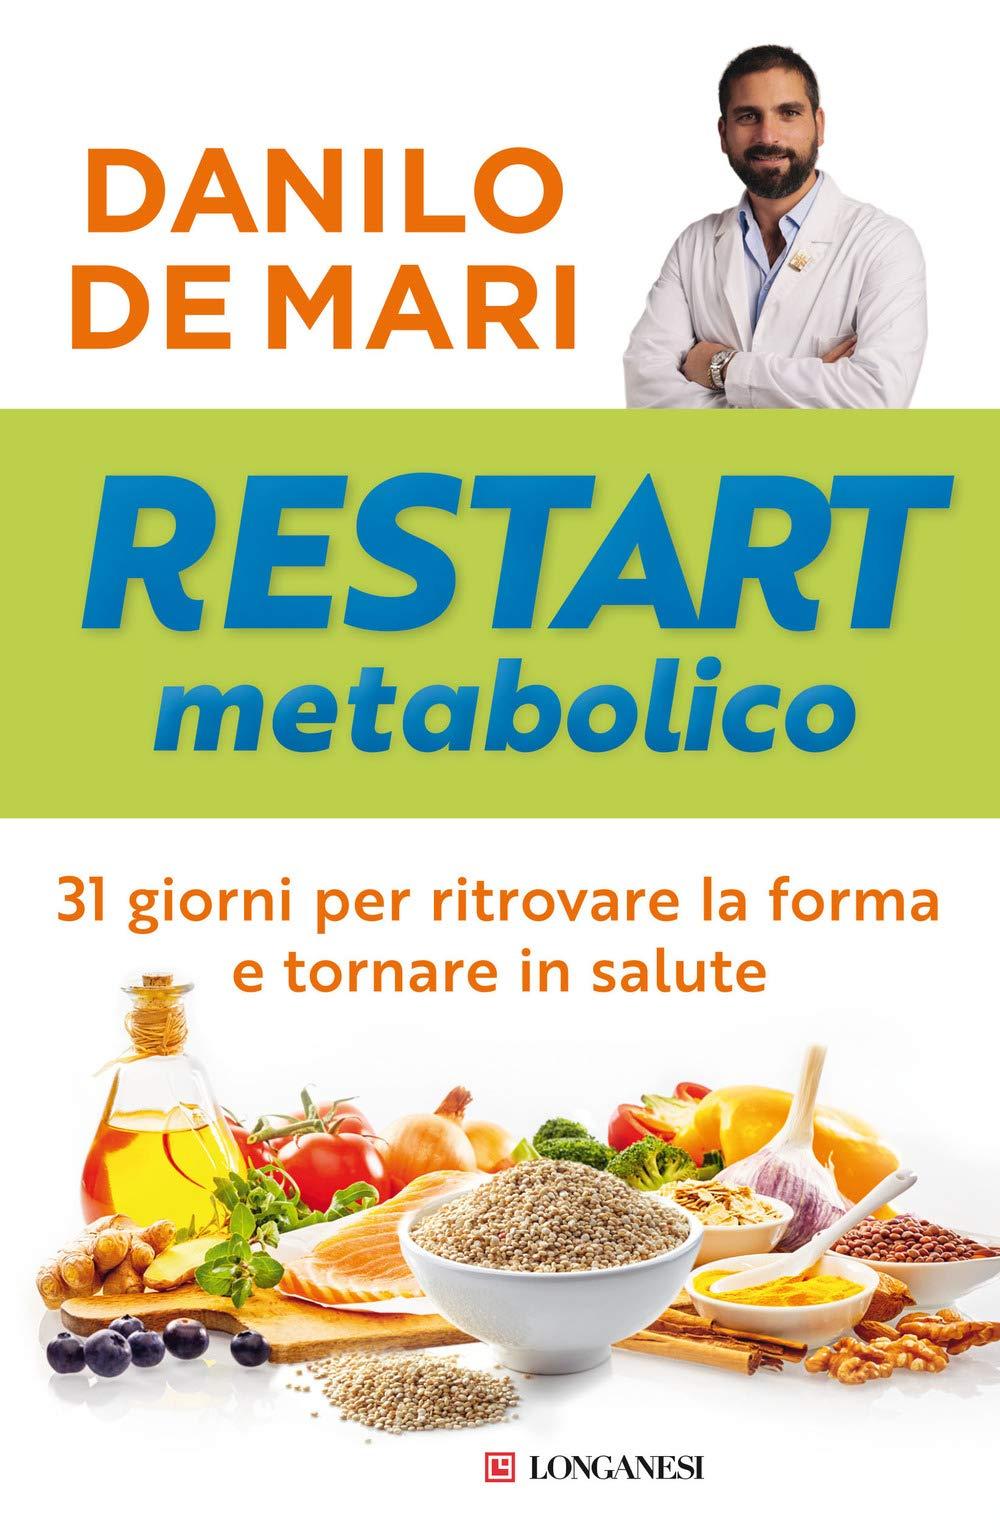 RESTART METABOLICO - DANILO DE MARI ed. Longanesi